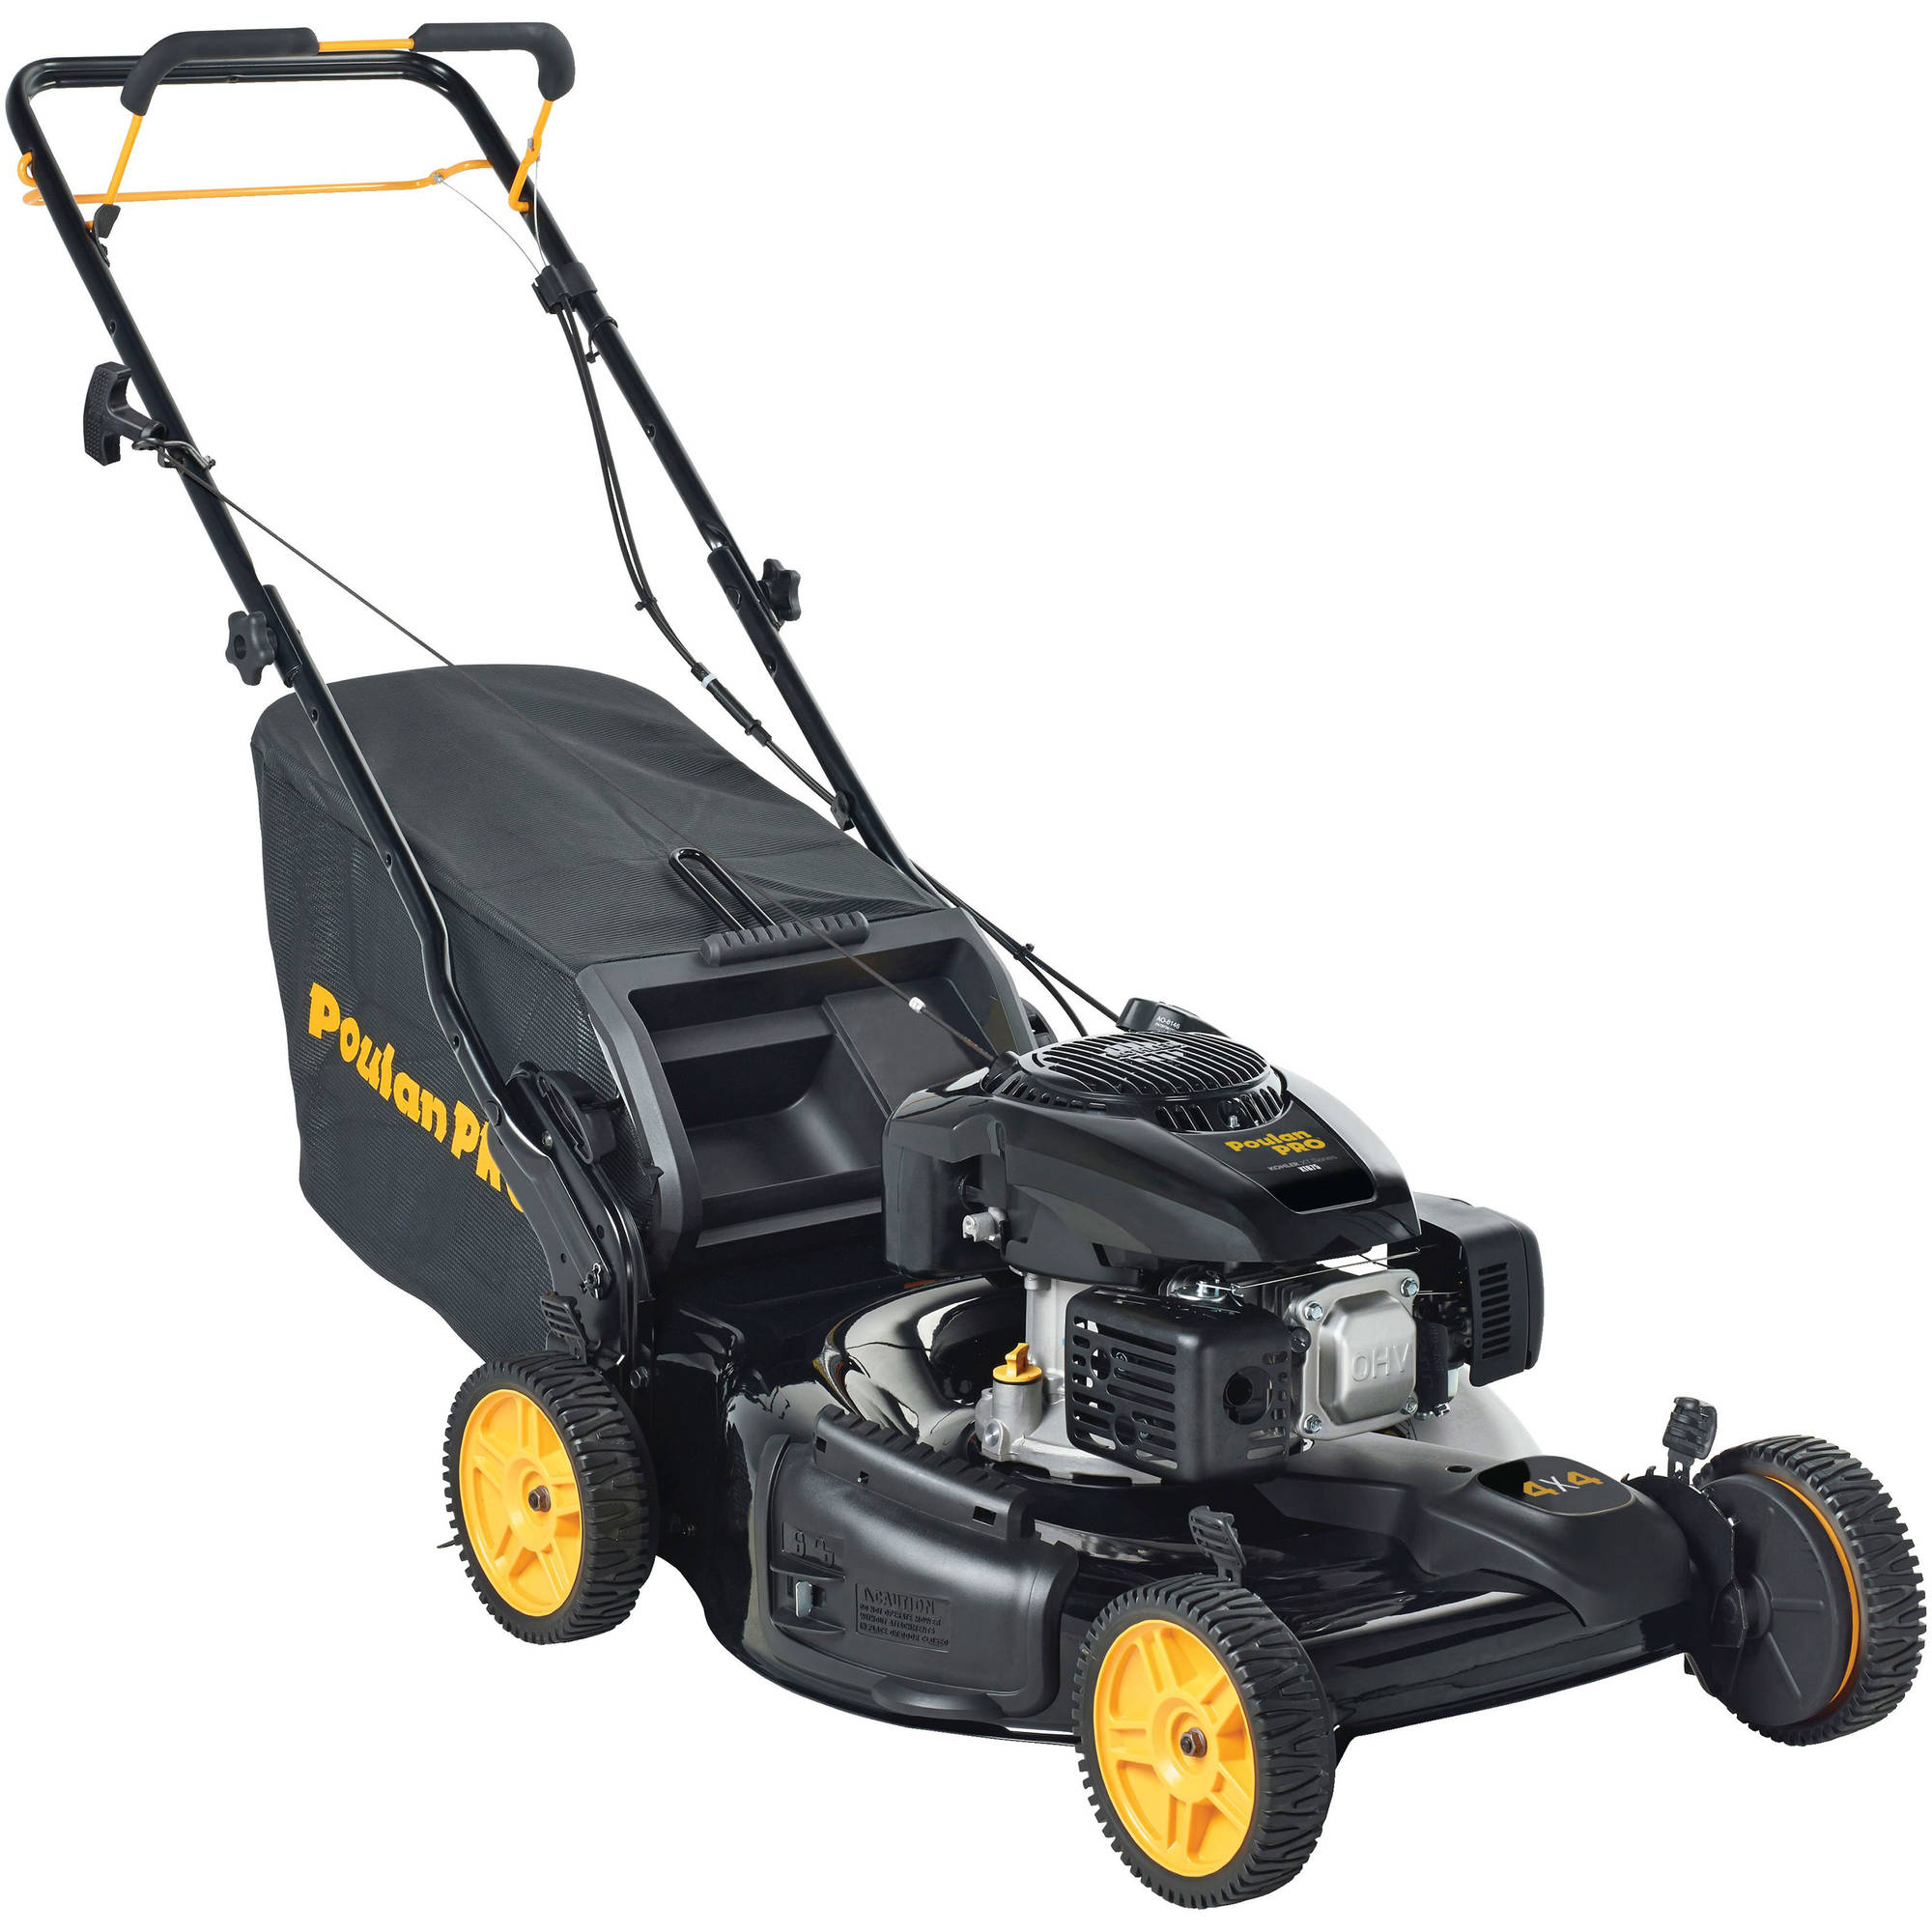 "Poulan Pro 21"" AWD Gas Lawn Mower w/Side Discharge, Mulching & Bagging"